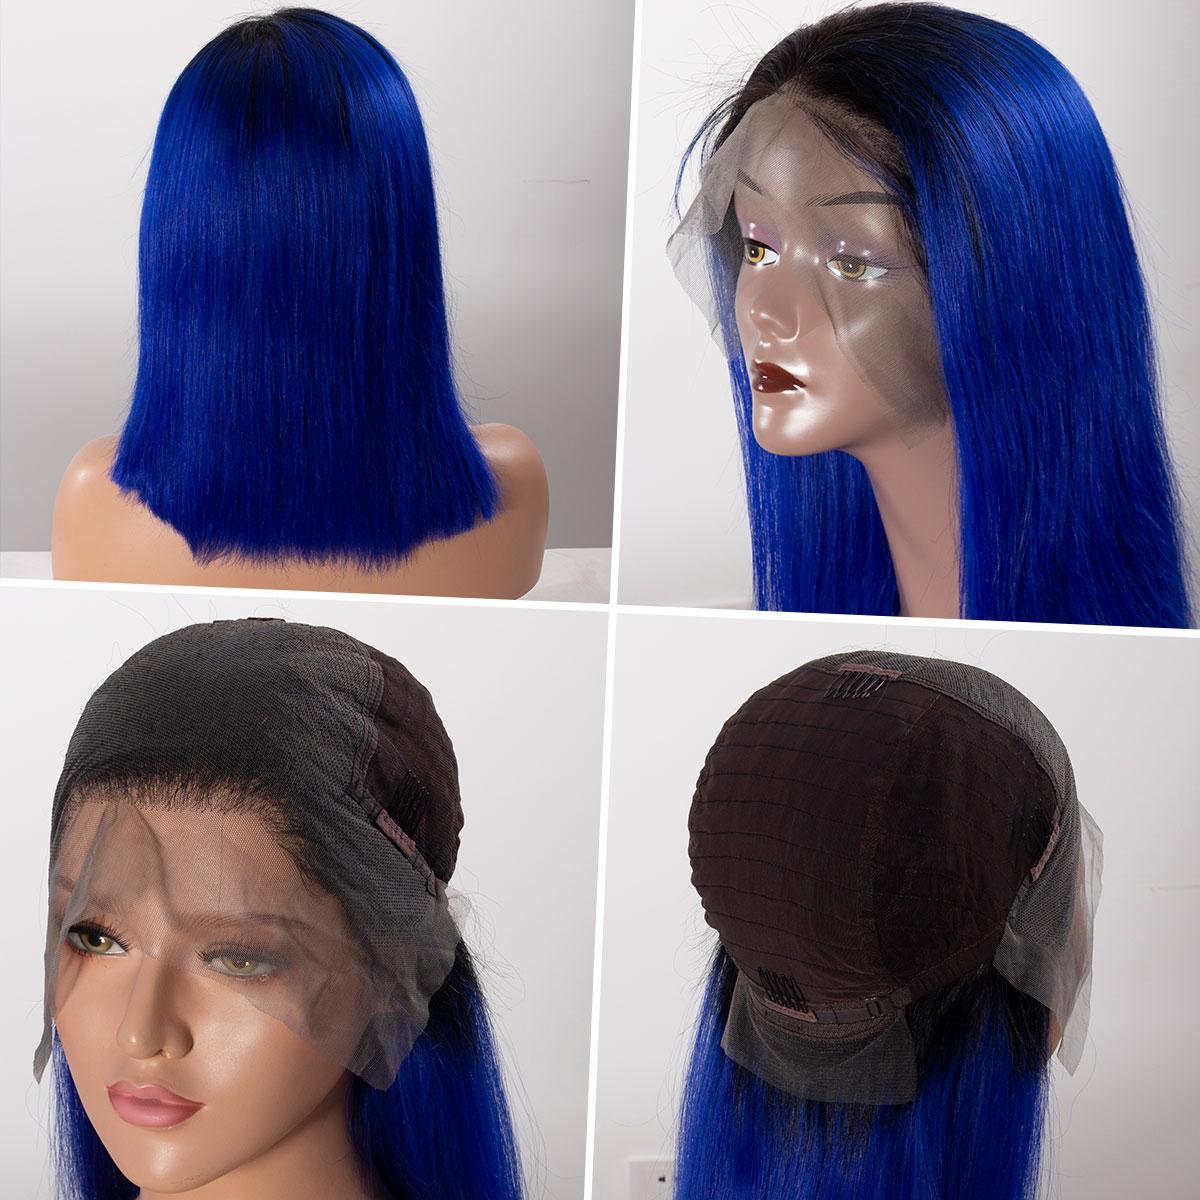 Colorful 13x6 Short Bob Straight Hair - 1B/Royal Blue